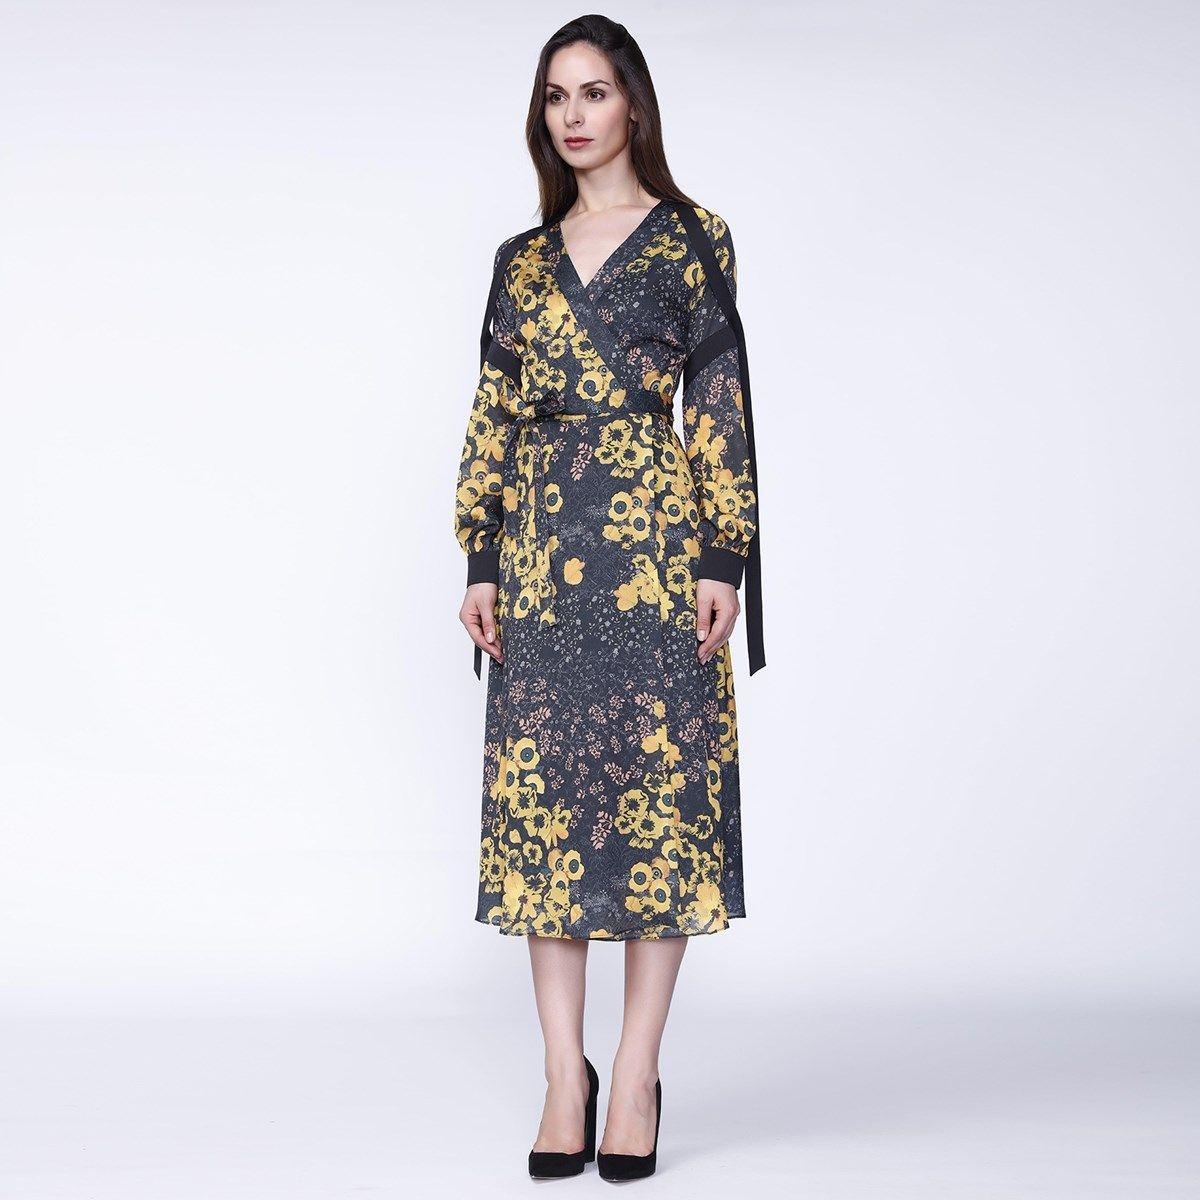 Robe portefeuille garnitures satin et imprimé floral